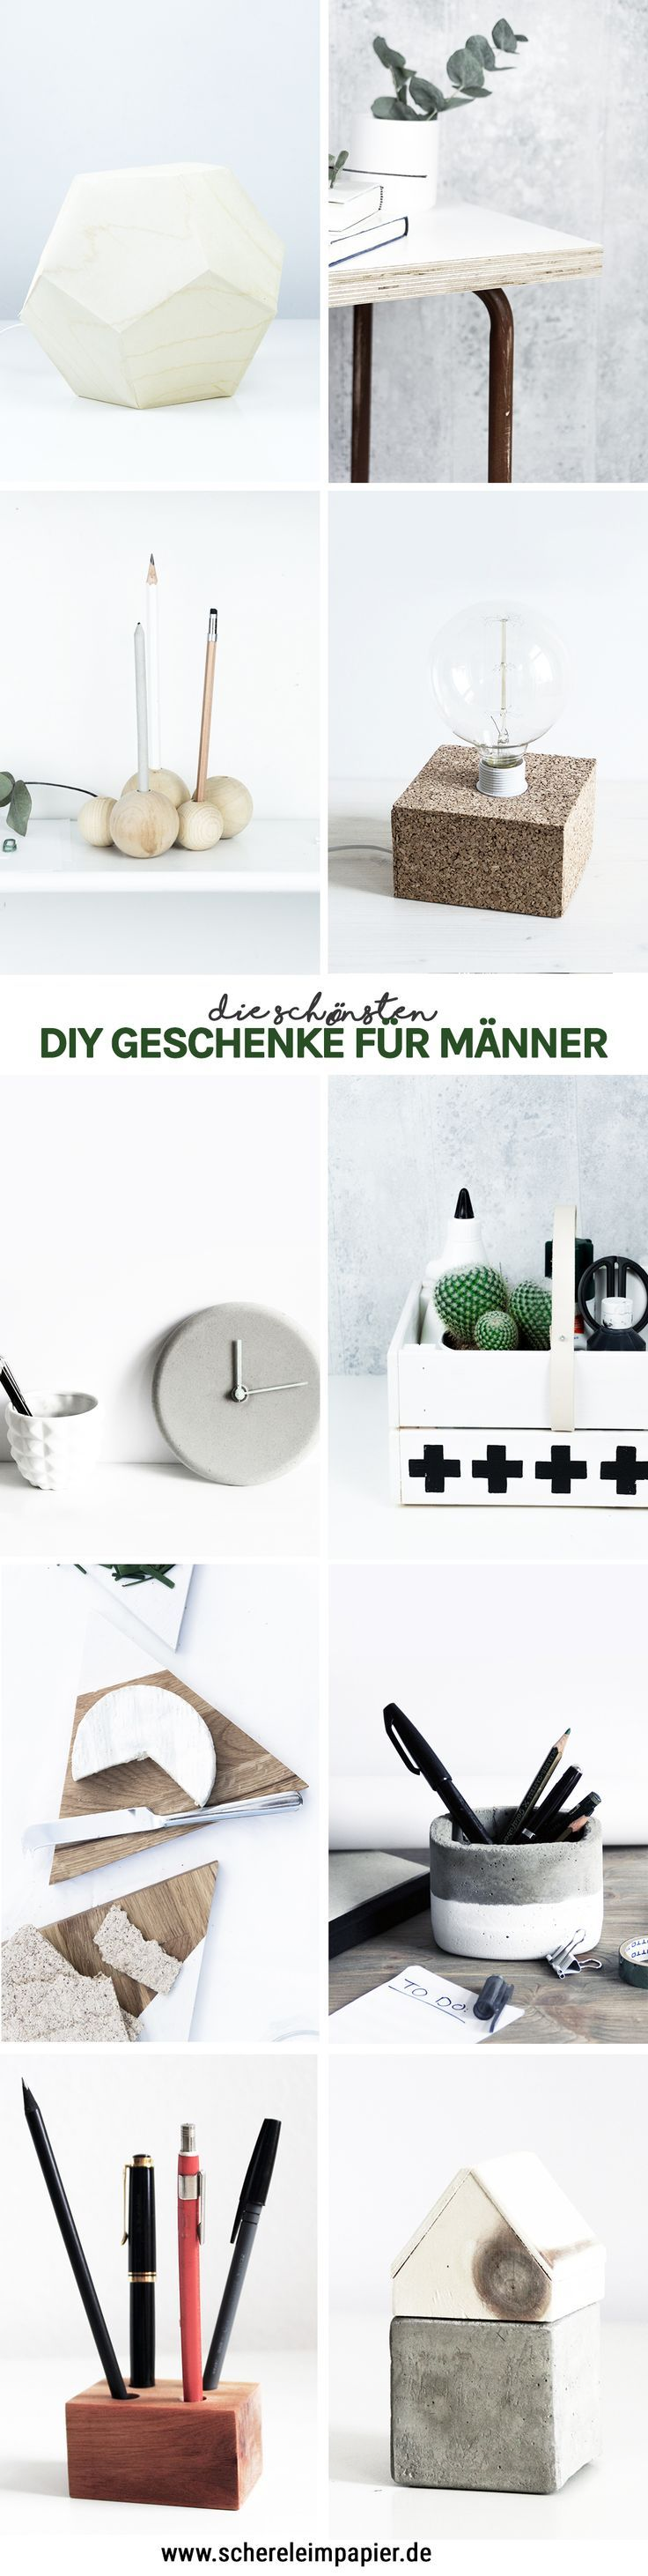 305 best diy personalisierte geschenke images on pinterest weddings bodas and bricolage. Black Bedroom Furniture Sets. Home Design Ideas